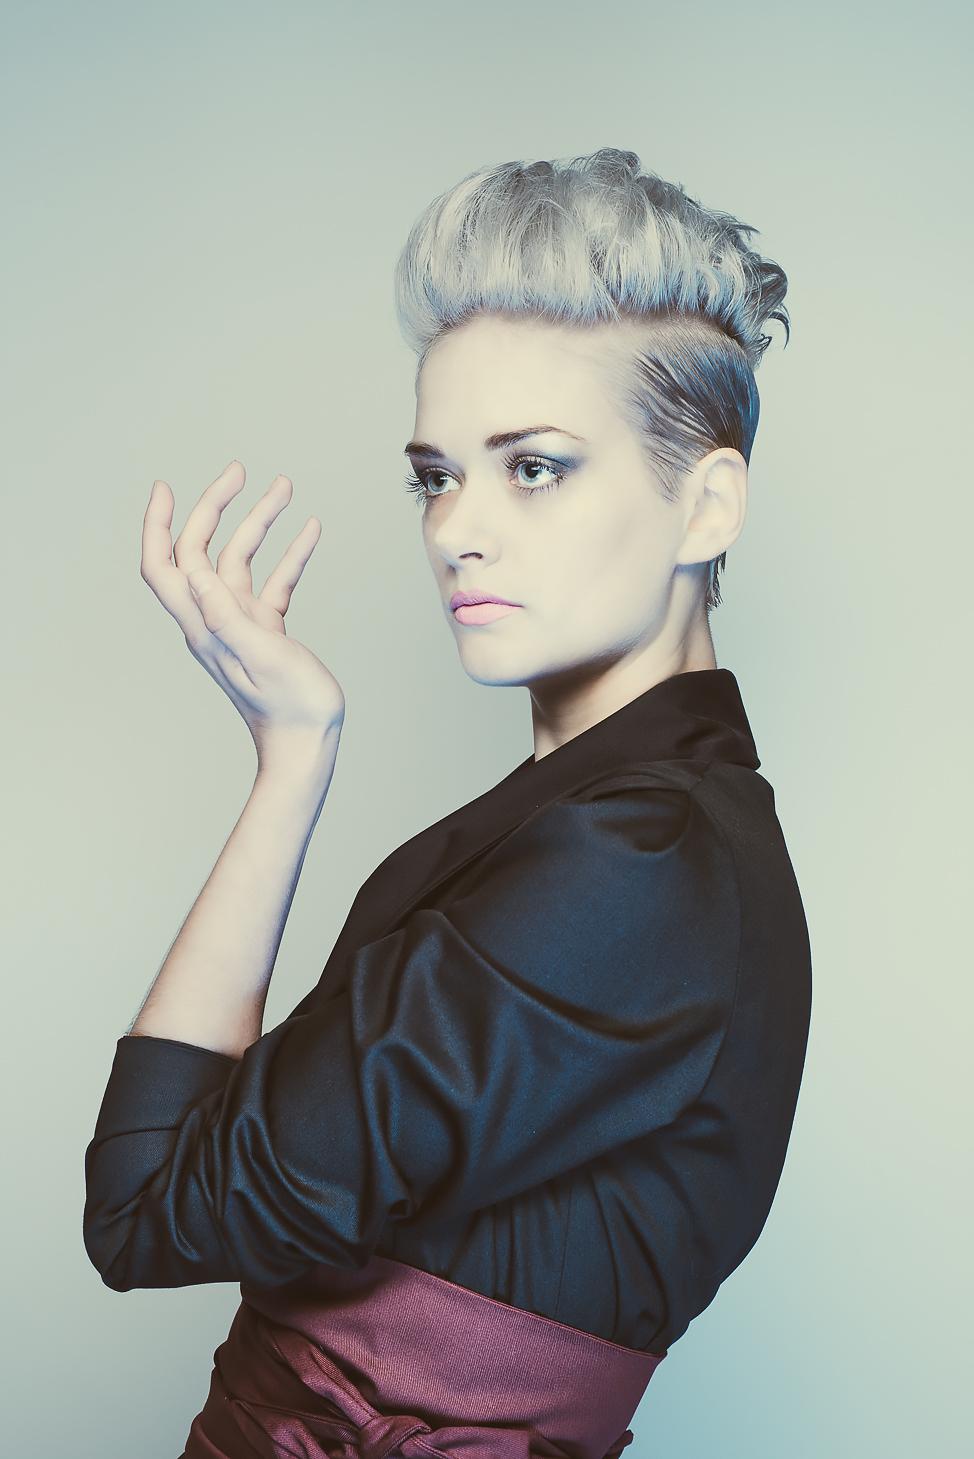 zaramia-ava-zaramiaava-leeds-fashion-designer-ethical-sustainable-tailored-minimalist-mio-black-jacket-top-red-belt-versatile-drape-cowl-styling-menswear-models-photoshoot-shrine-hairdressers-35